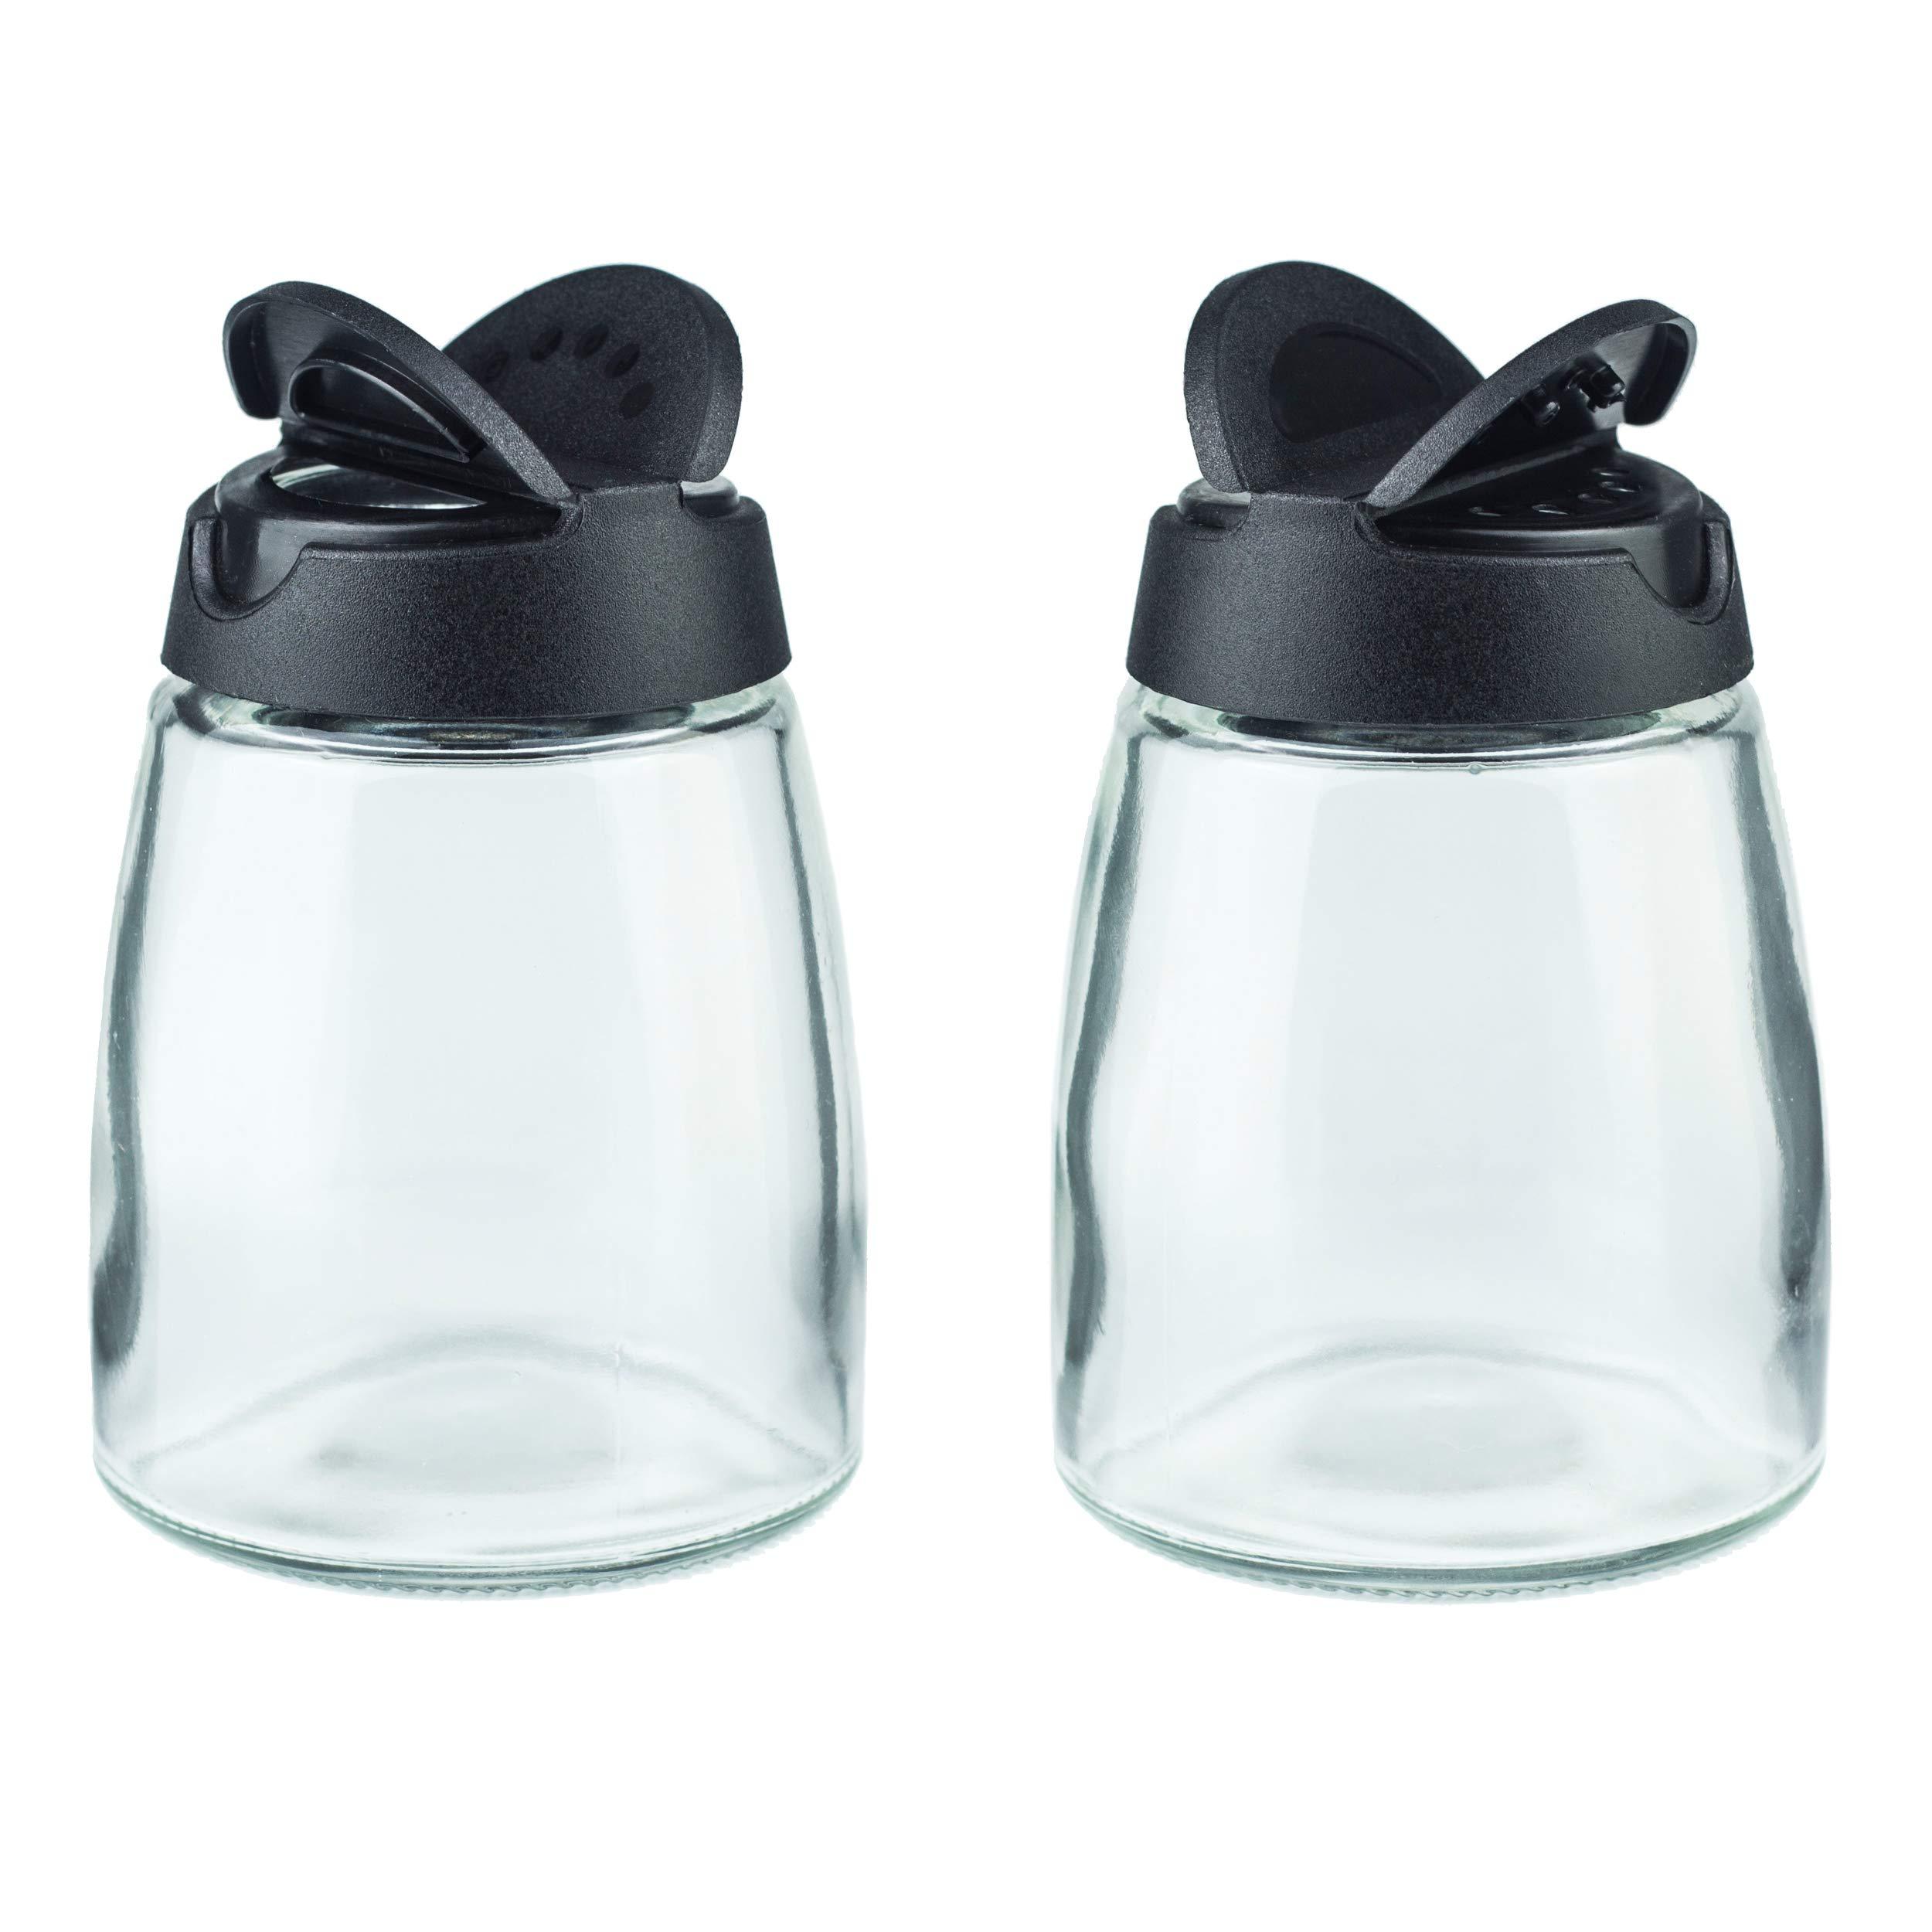 Salt & Pepper Shakers, Moisture-Proof Condiment holders, 2/pack by MILEKE